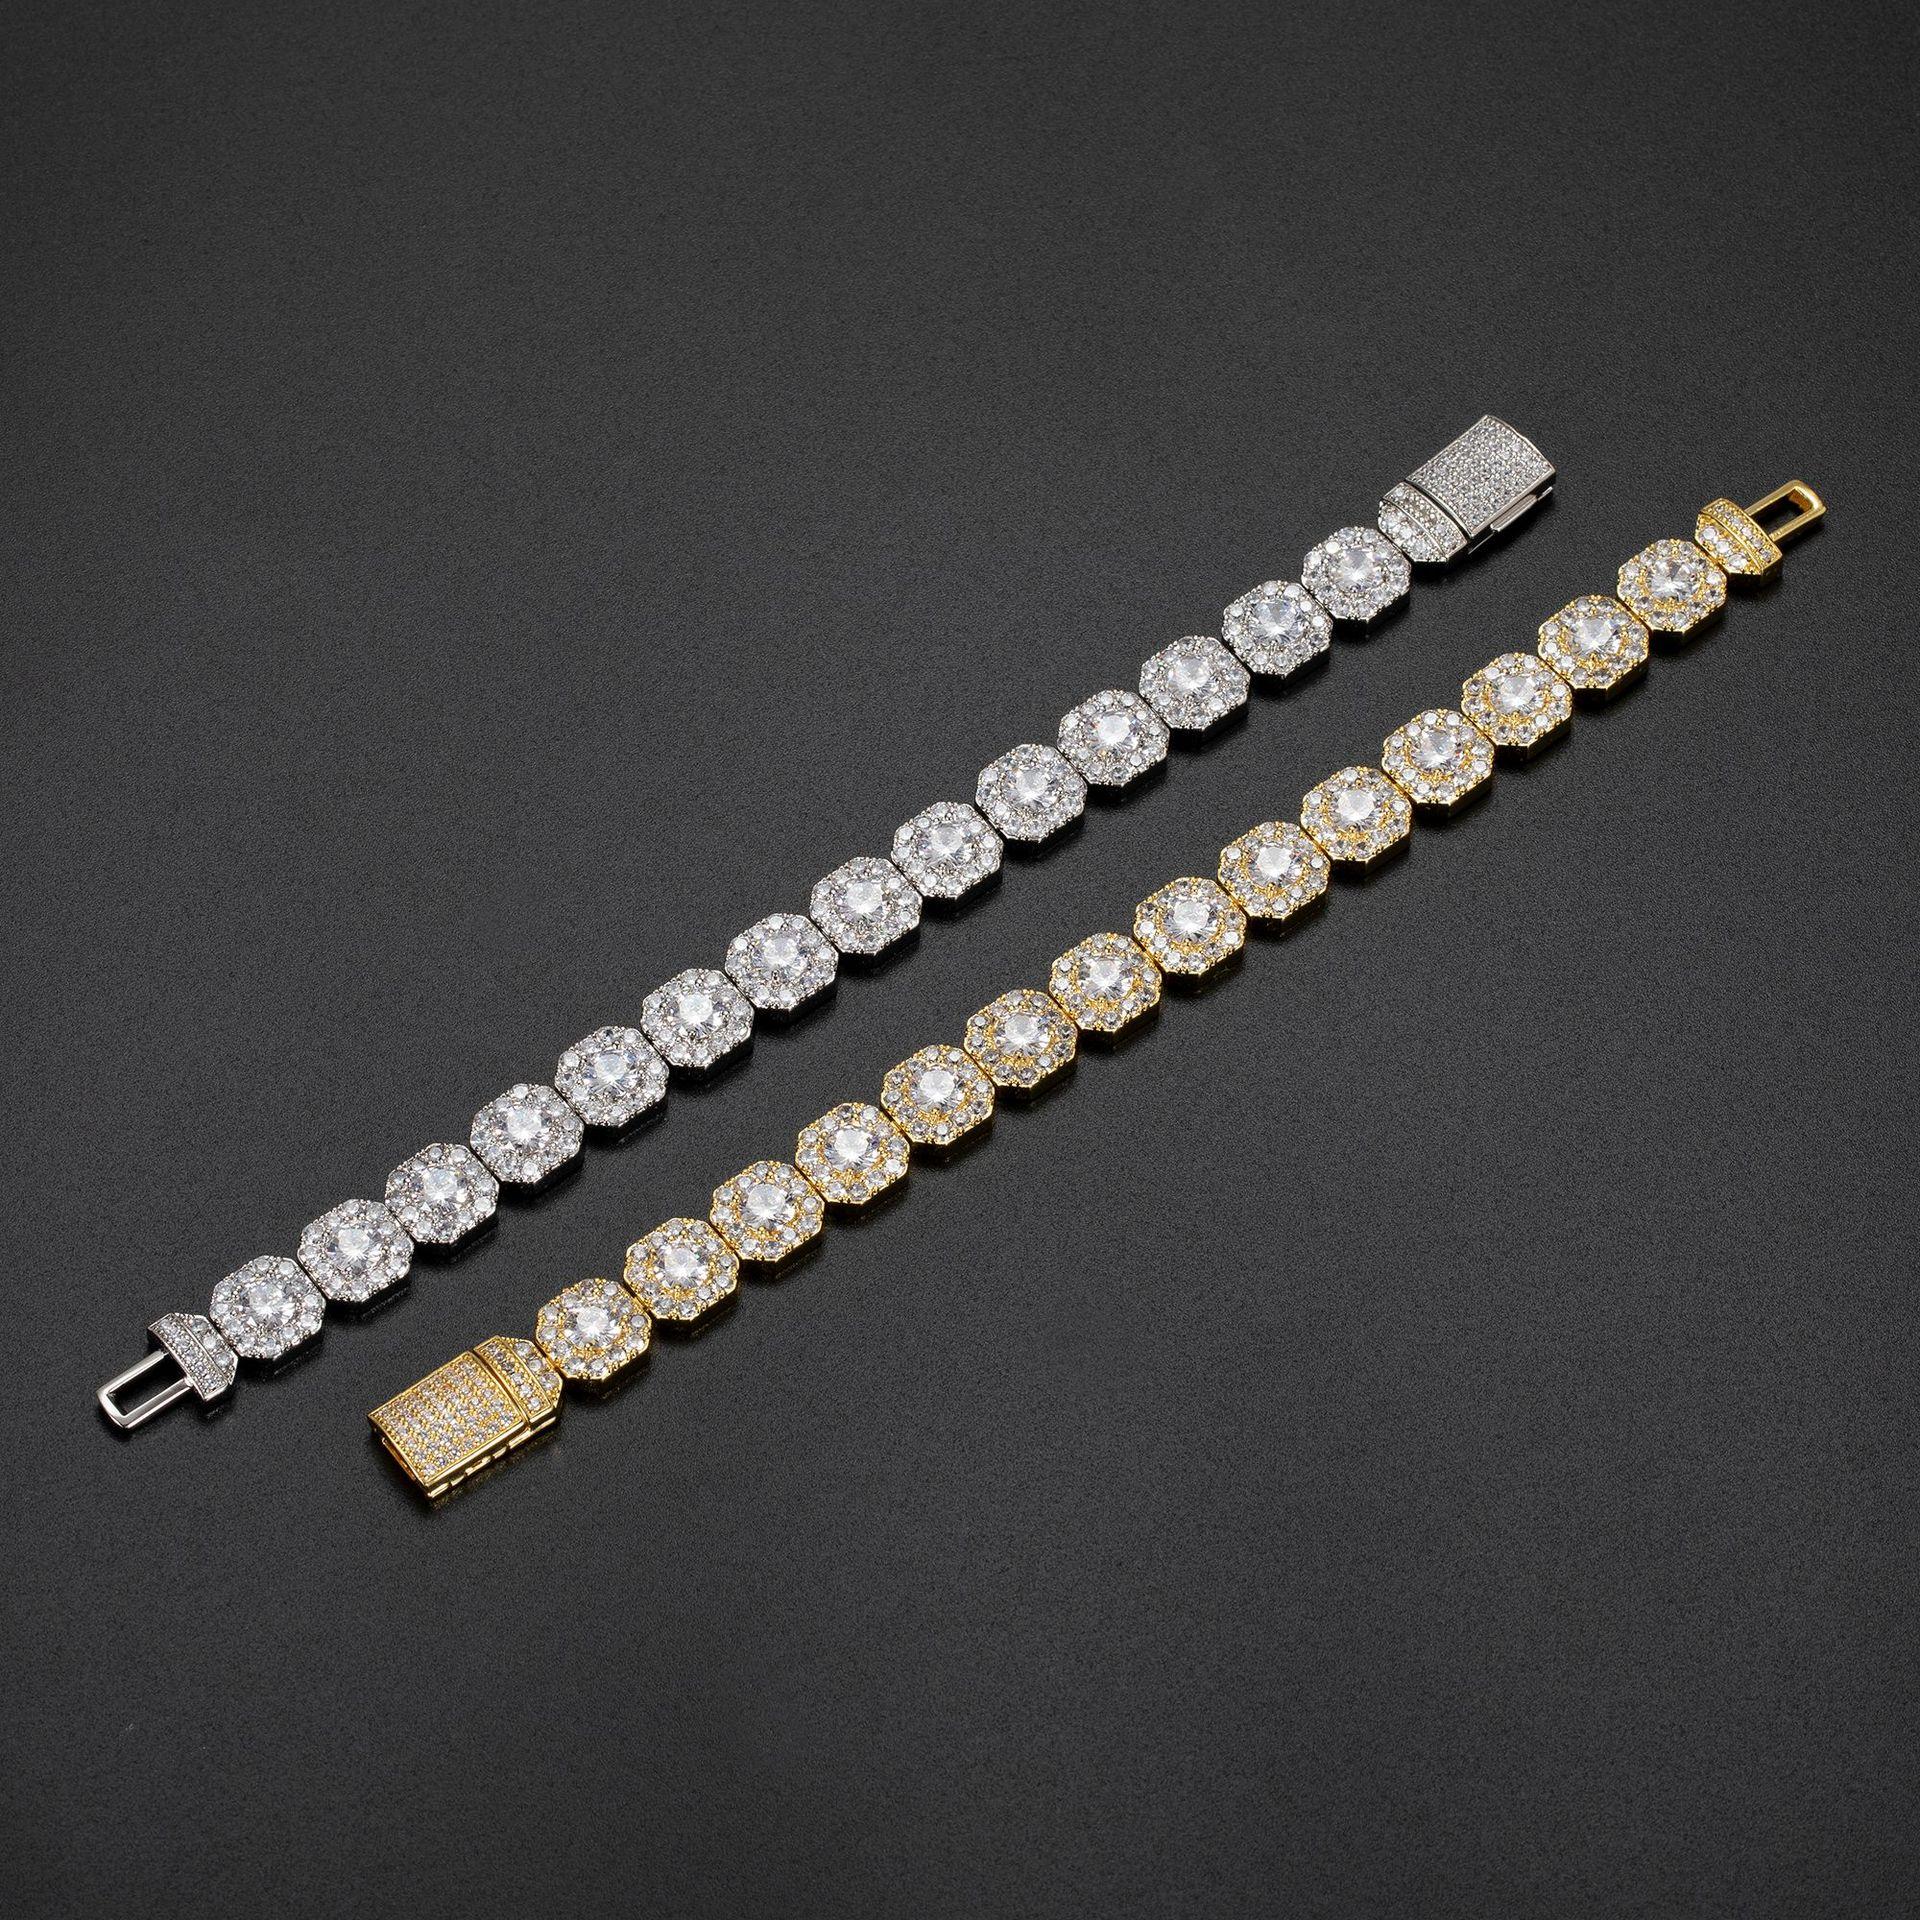 Elegant Octagon Bracelets for Girly Chic Look